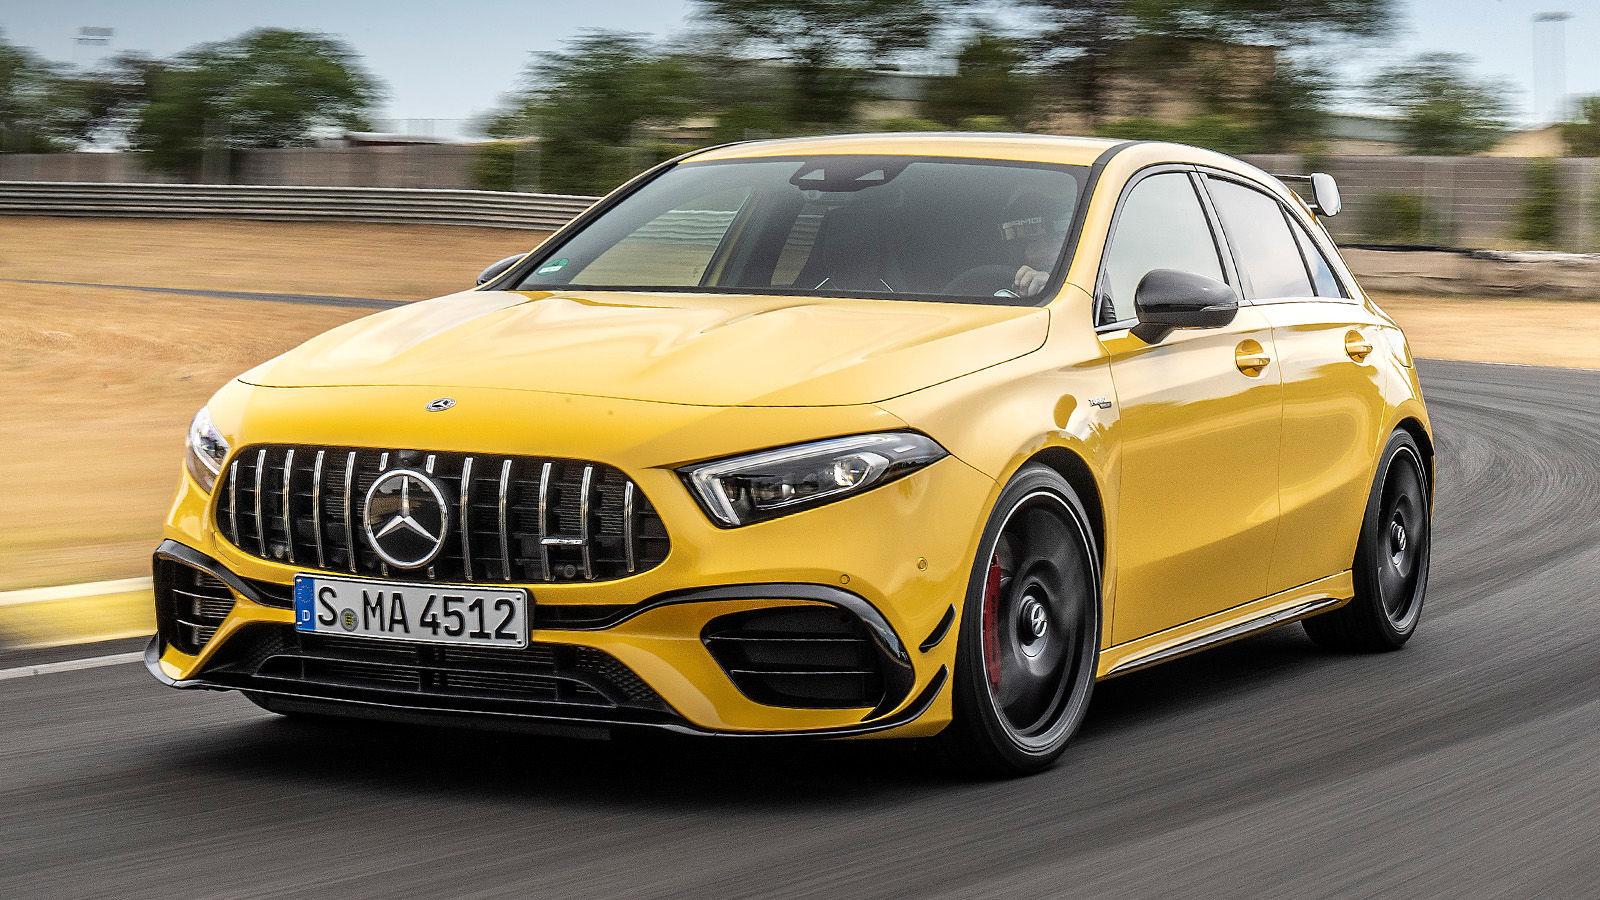 Mercedes-AMG A 45 S (2019): Test - Motor - Infos - AUTO BILD